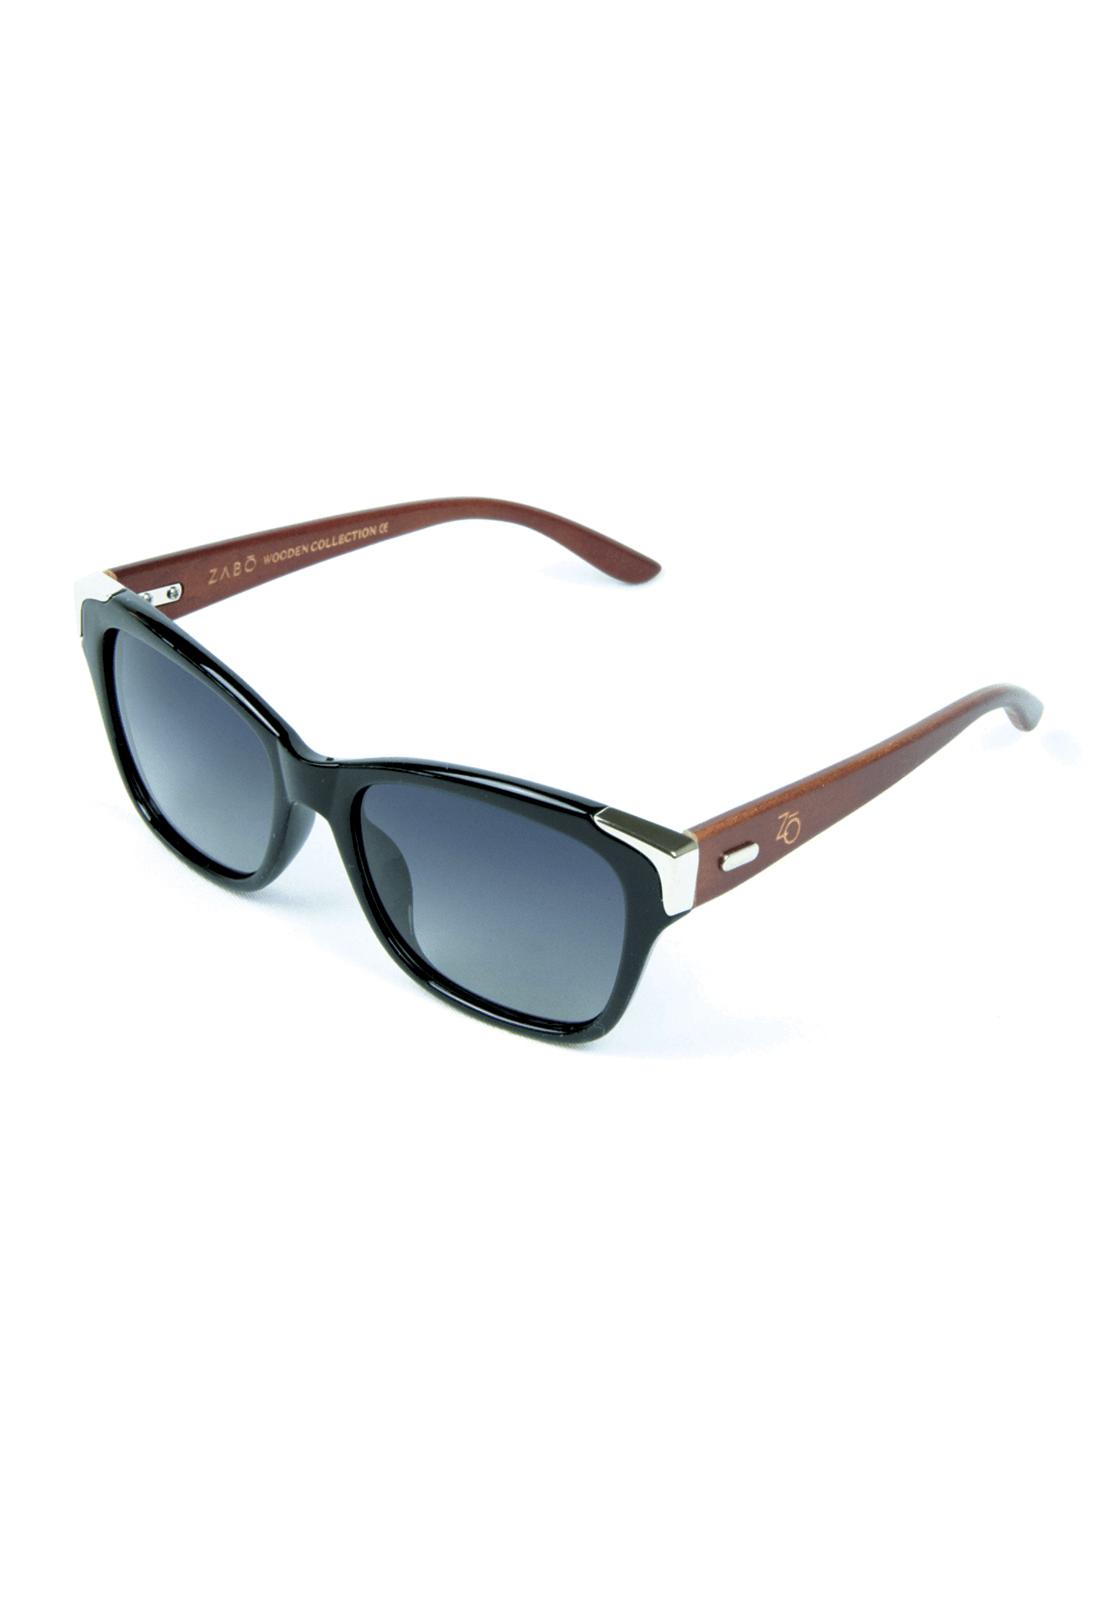 f7d643af1 Óculos de Sol Polarizado Zabô Barcelona Preto Lentes Black